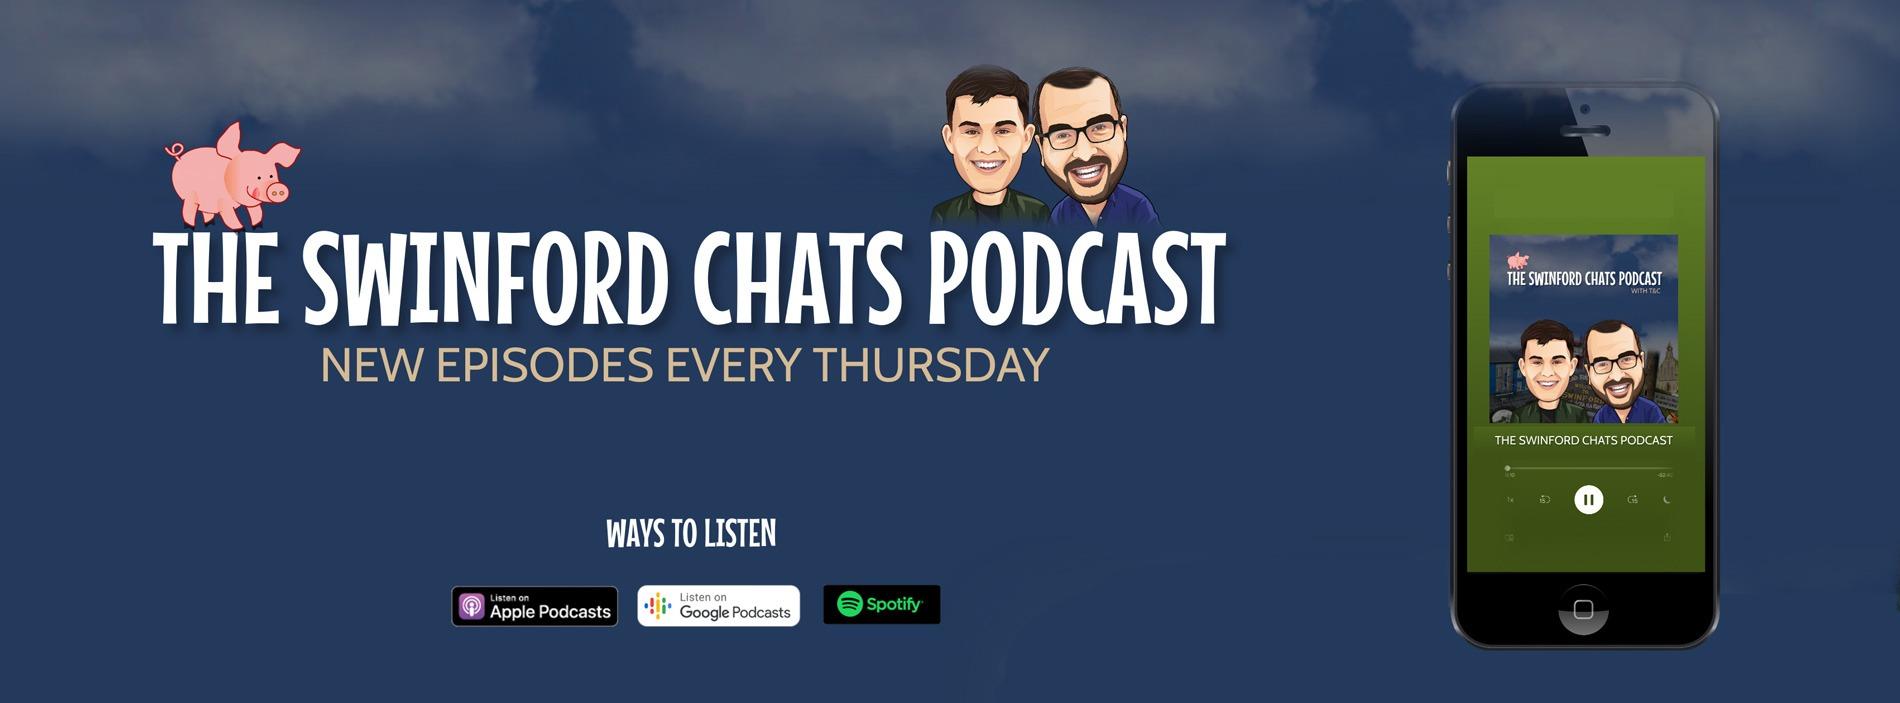 Swinford-Chats-Podcast-Co-Mayo